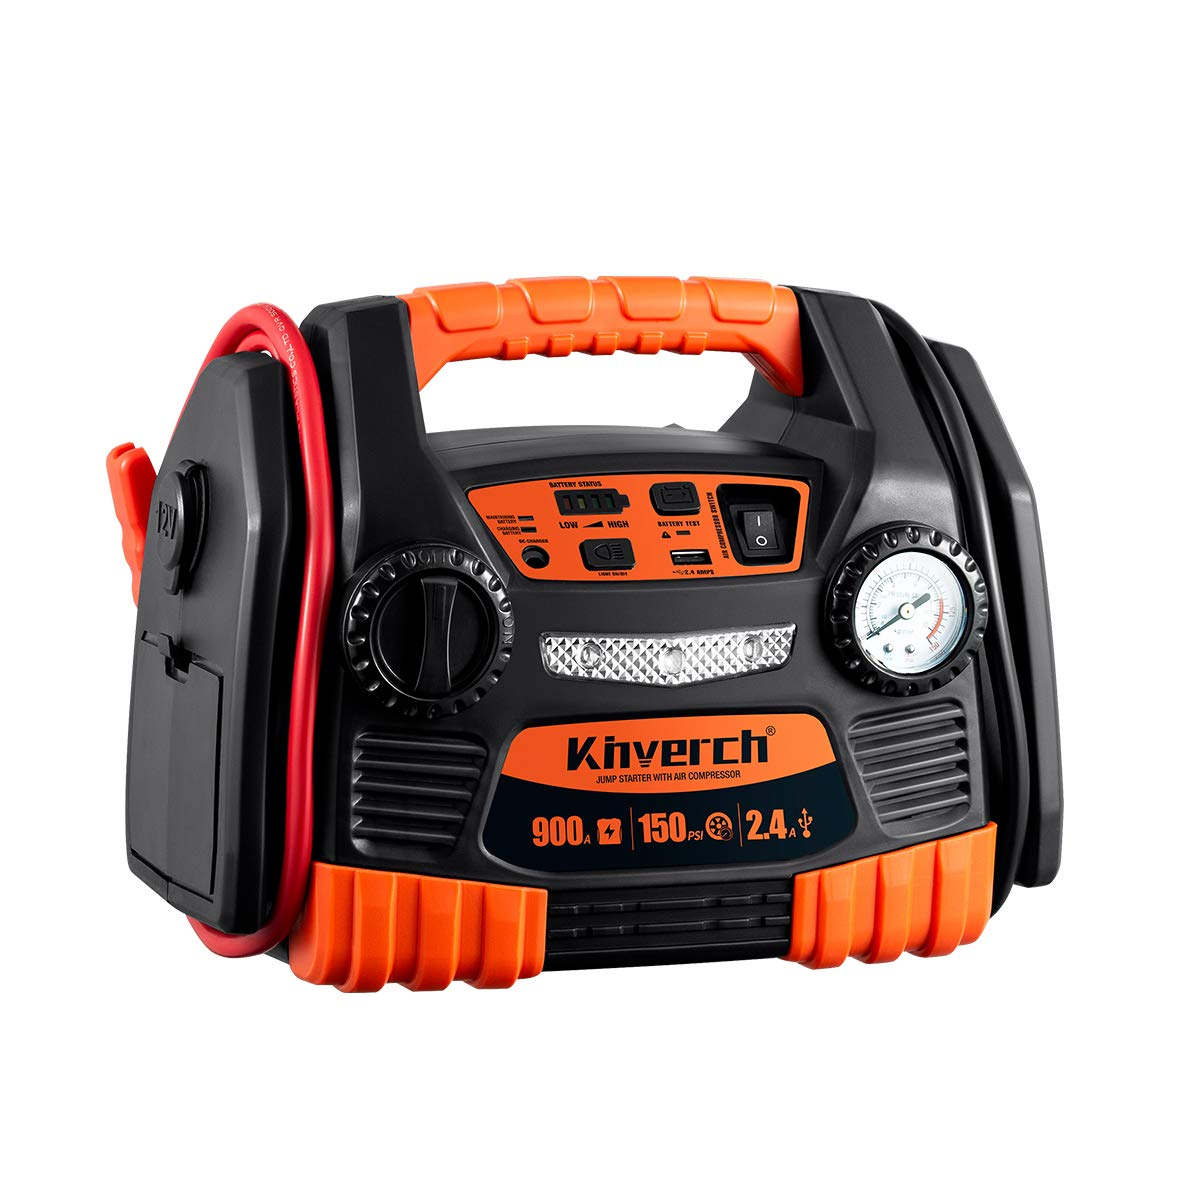 Kinverch Portable Car Jump Starter 900 Peak Amp 12 Volt with 1-USB 1-12V Power Ports & 150 PSI Air Compressor